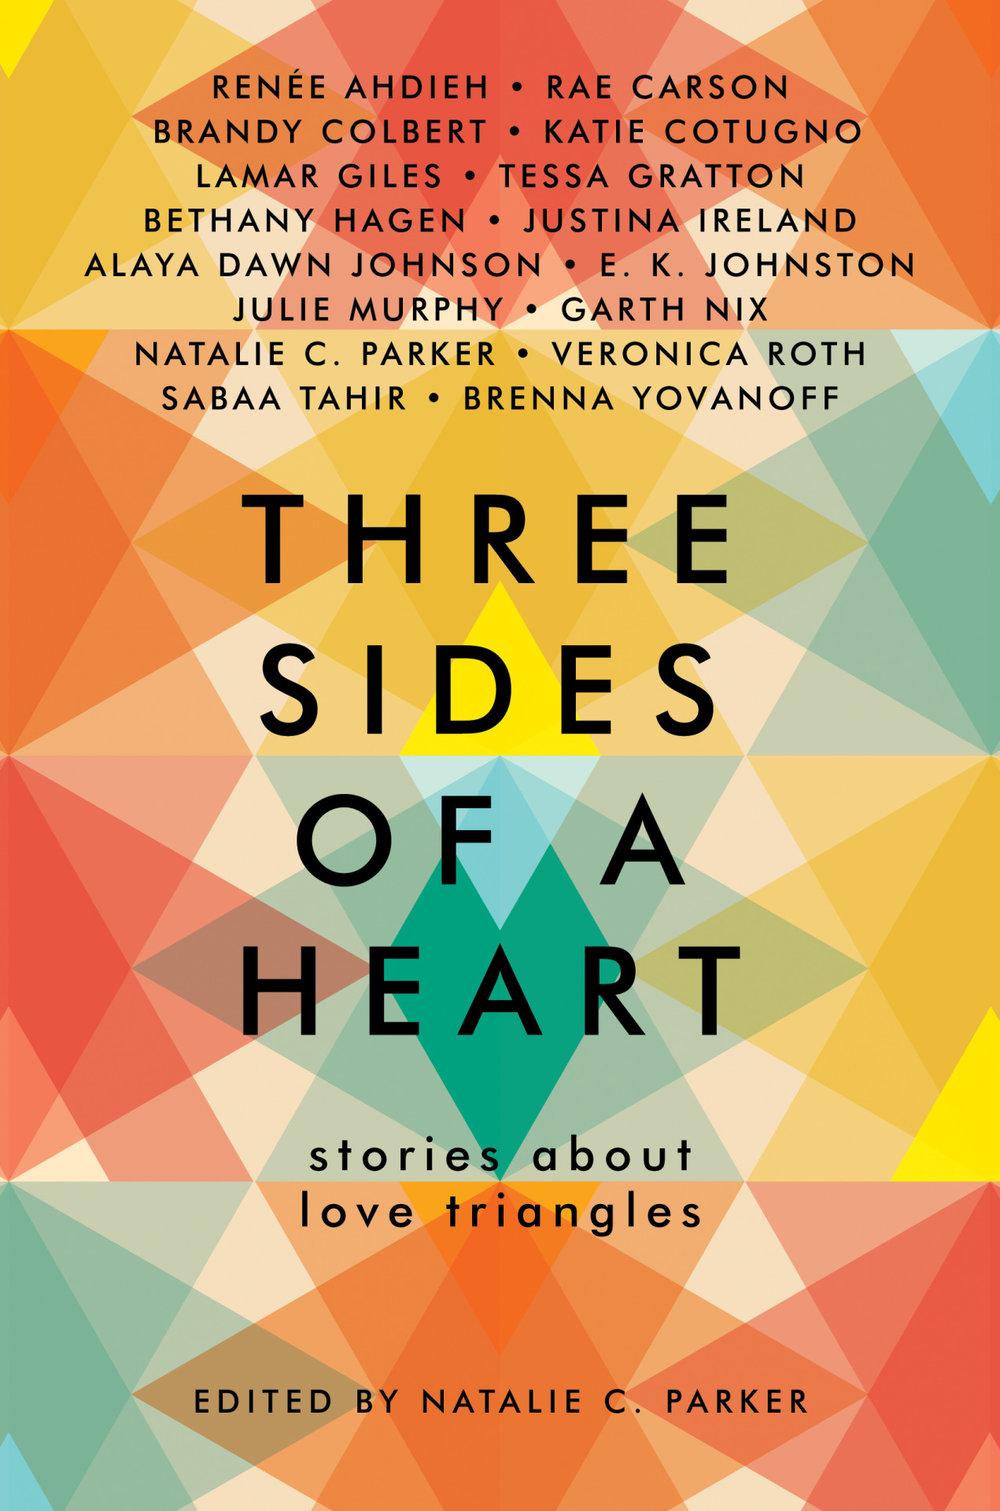 murphy-three-sides-heart.jpg